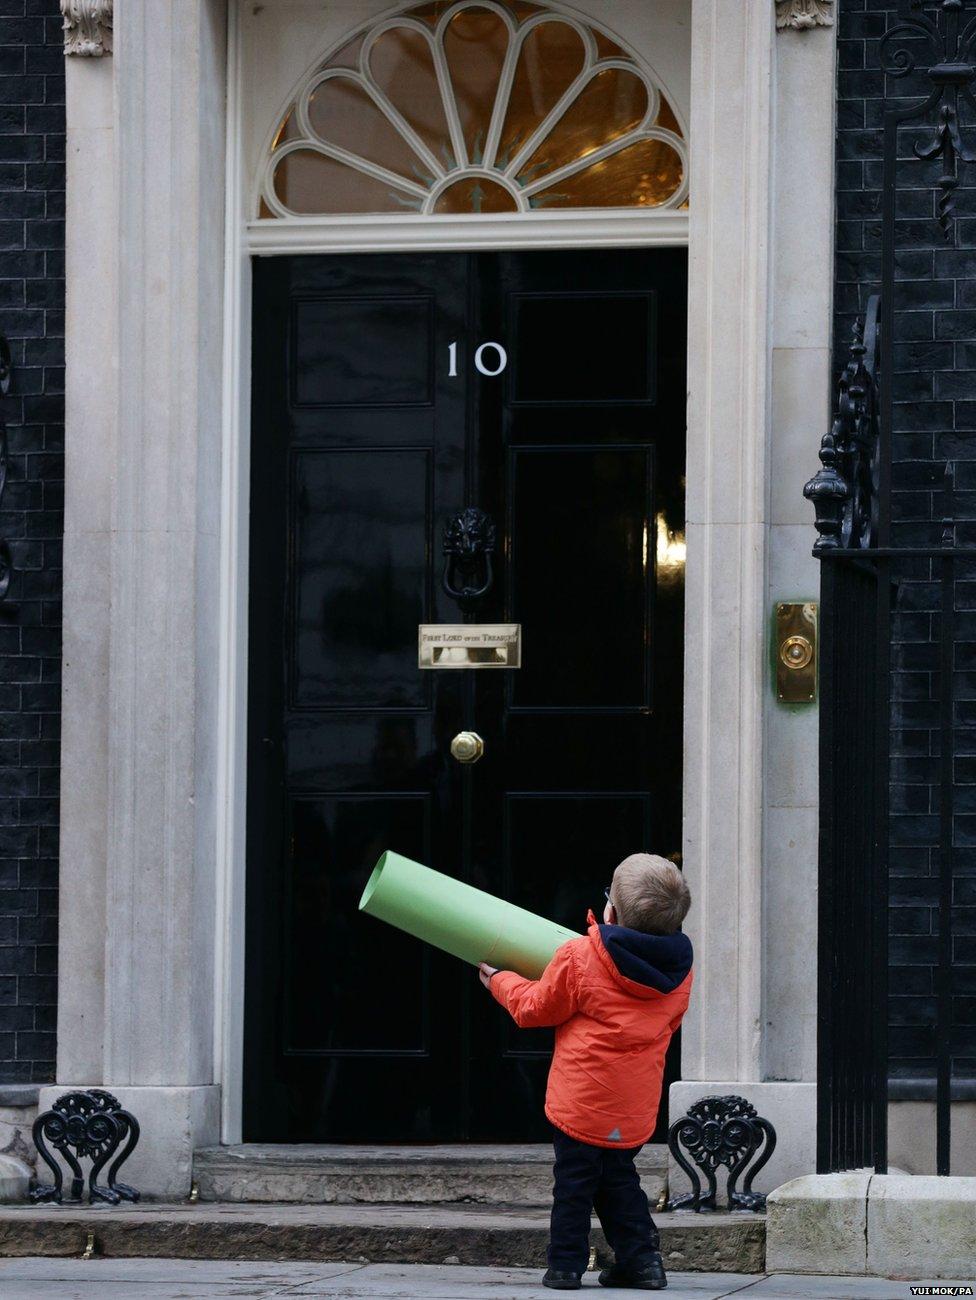 Six year-old Sam Brown at 10 Downing Street